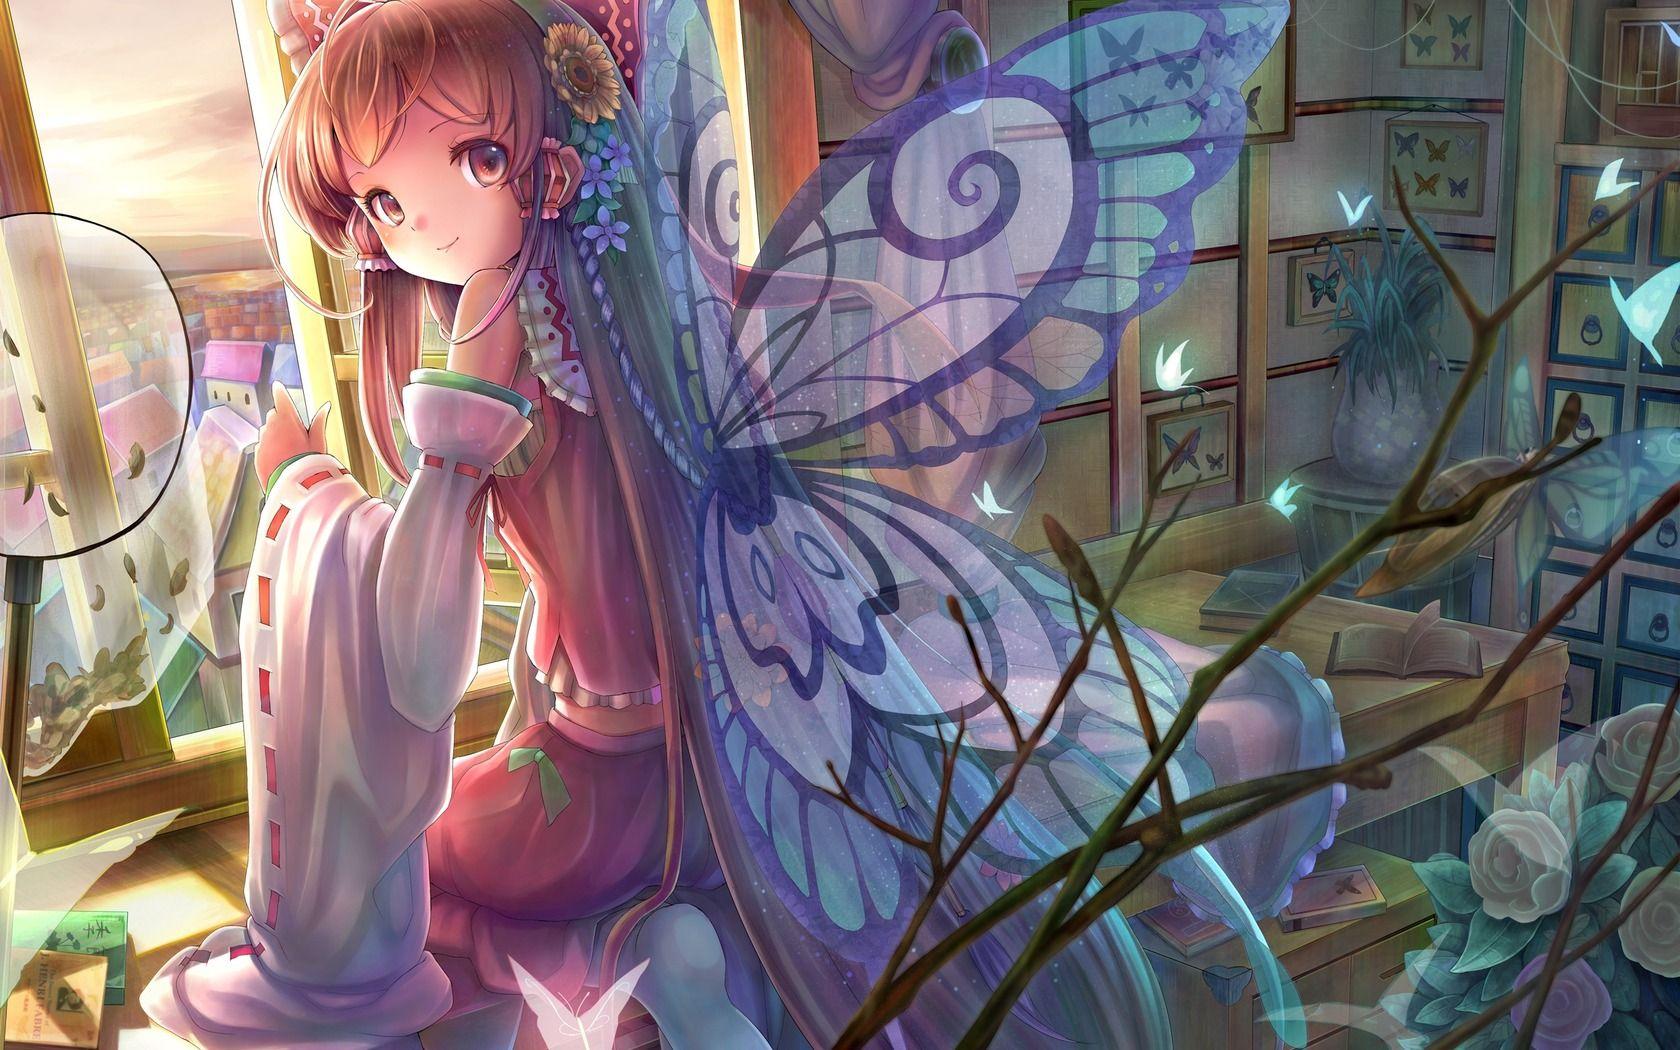 Download wallpaper girl, Sitting, wings, Butterflies free